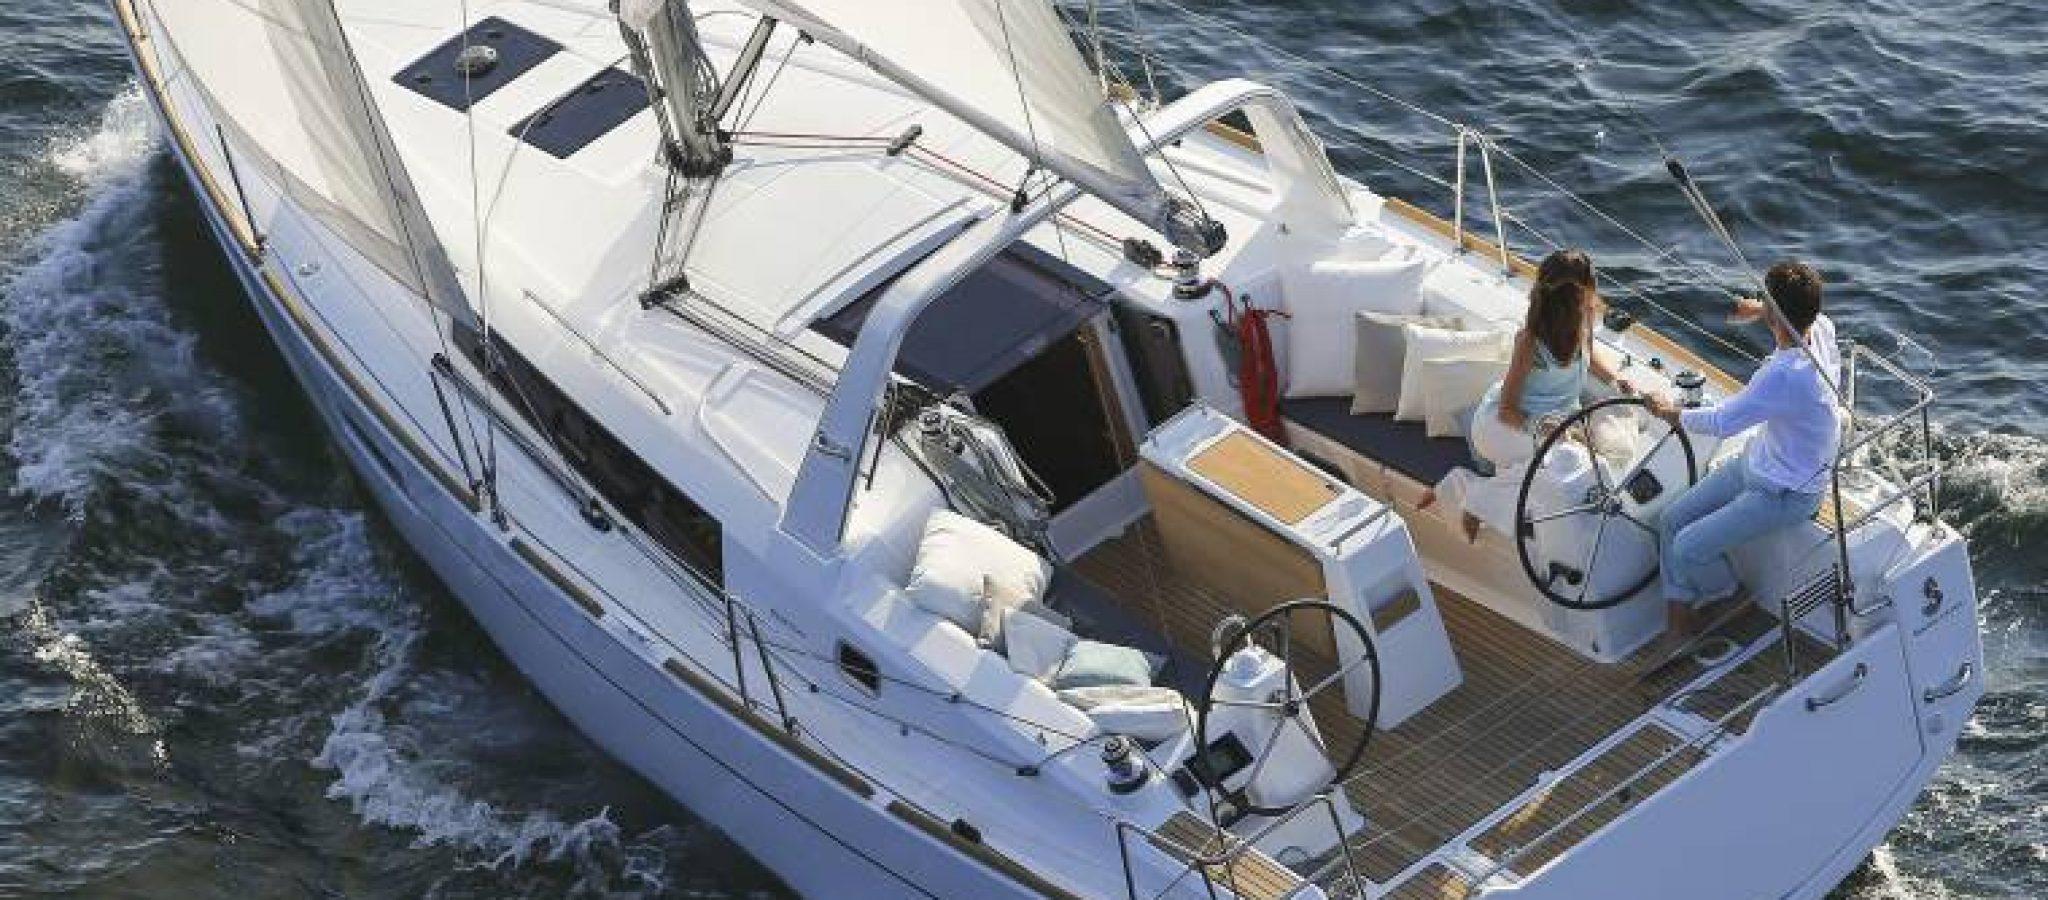 beneteau-oceanis-351-21193080172750496850576949664548x